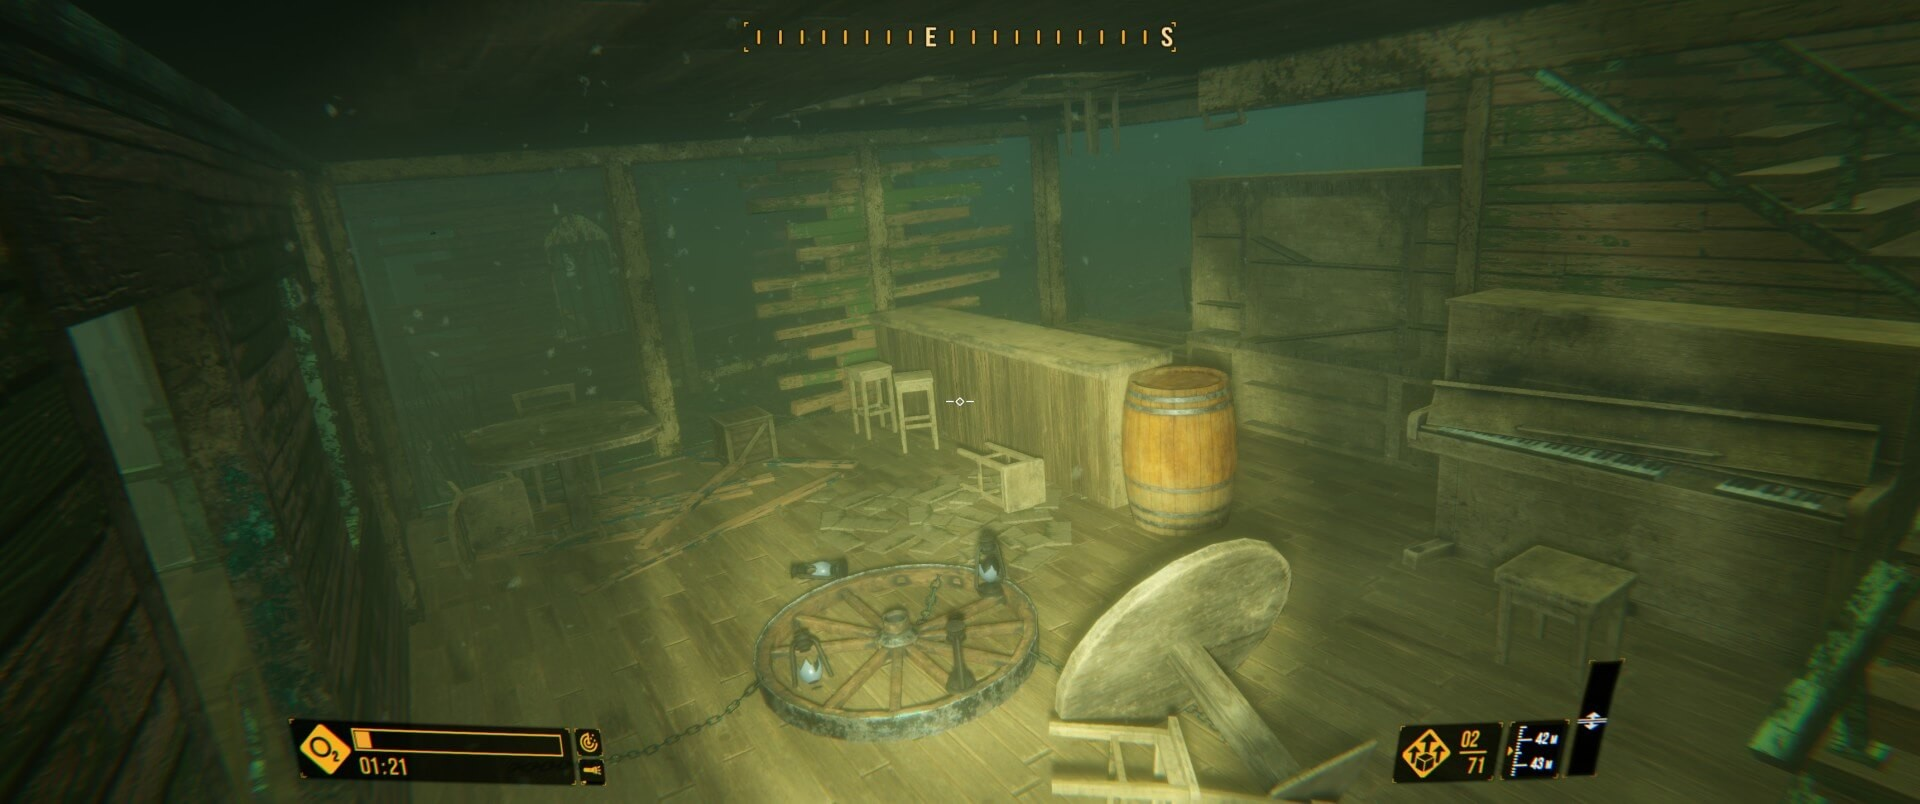 Deep Diving Simulator otrzymuje pierwszy dodatek Adventure Pack 3